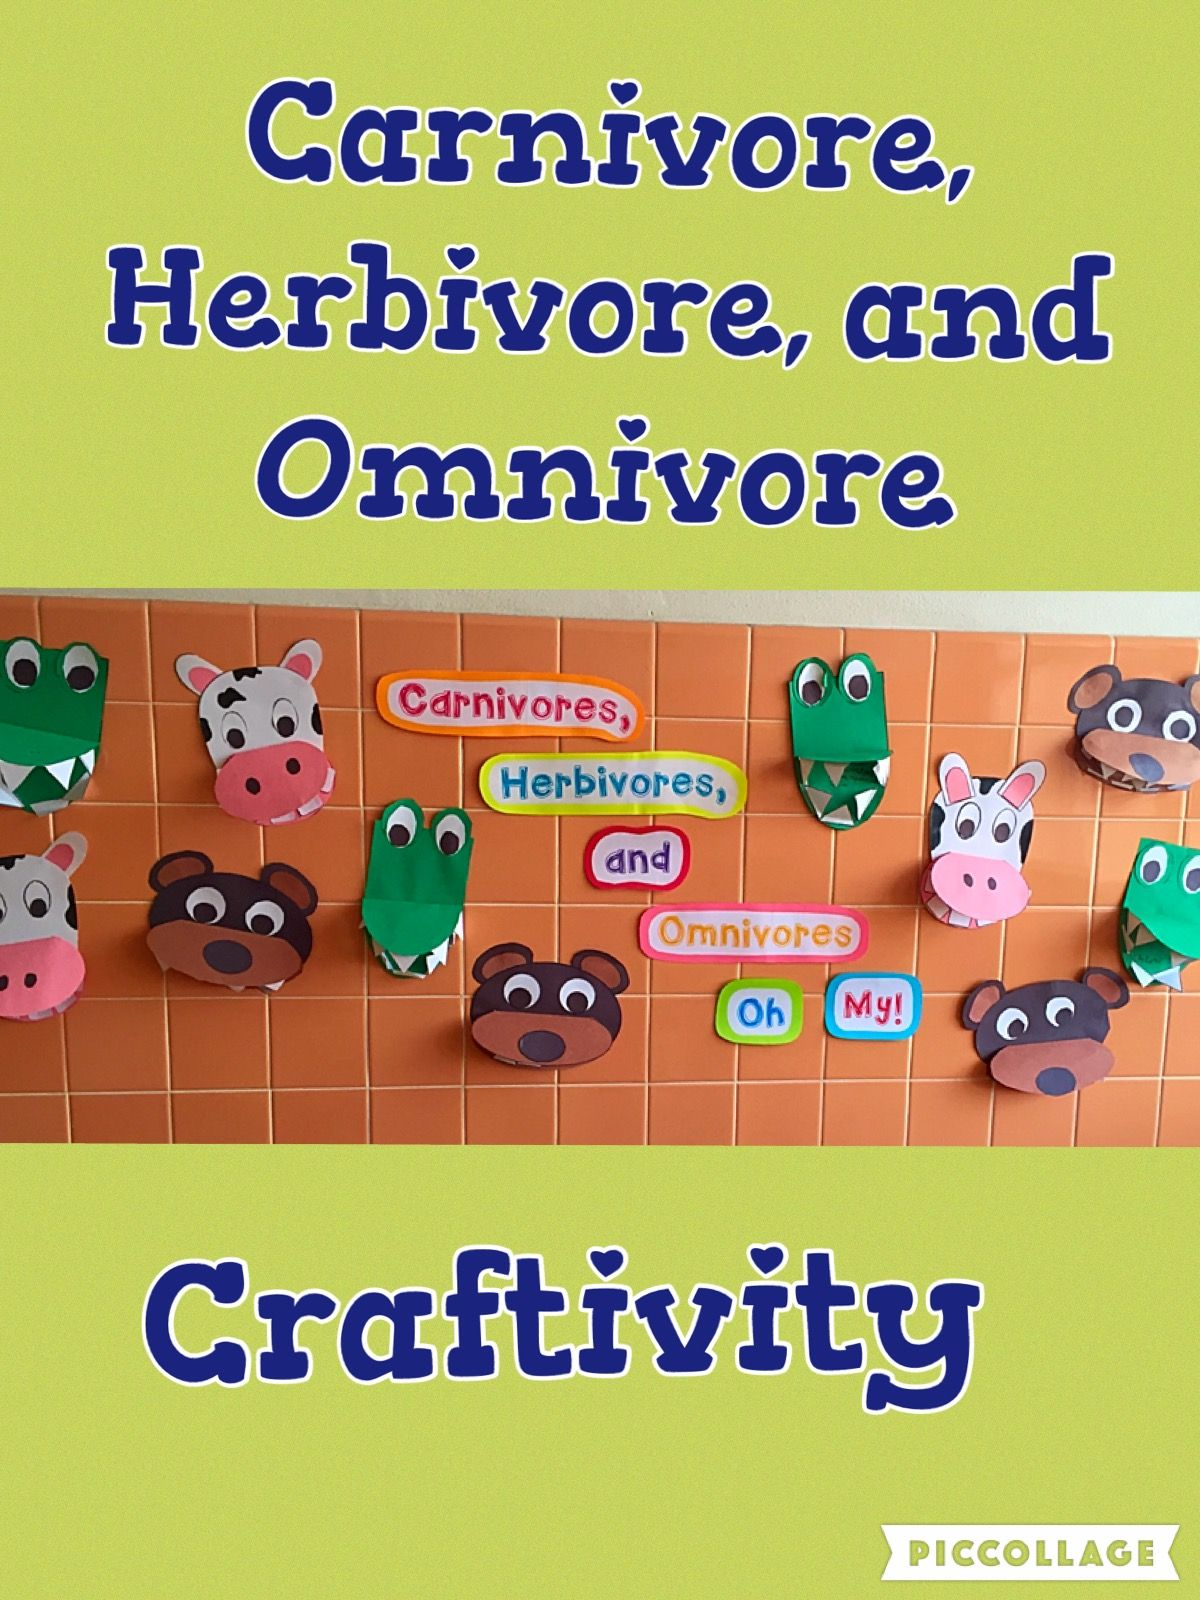 Carnivore Herbivore Amp Omnivore Craftivities And